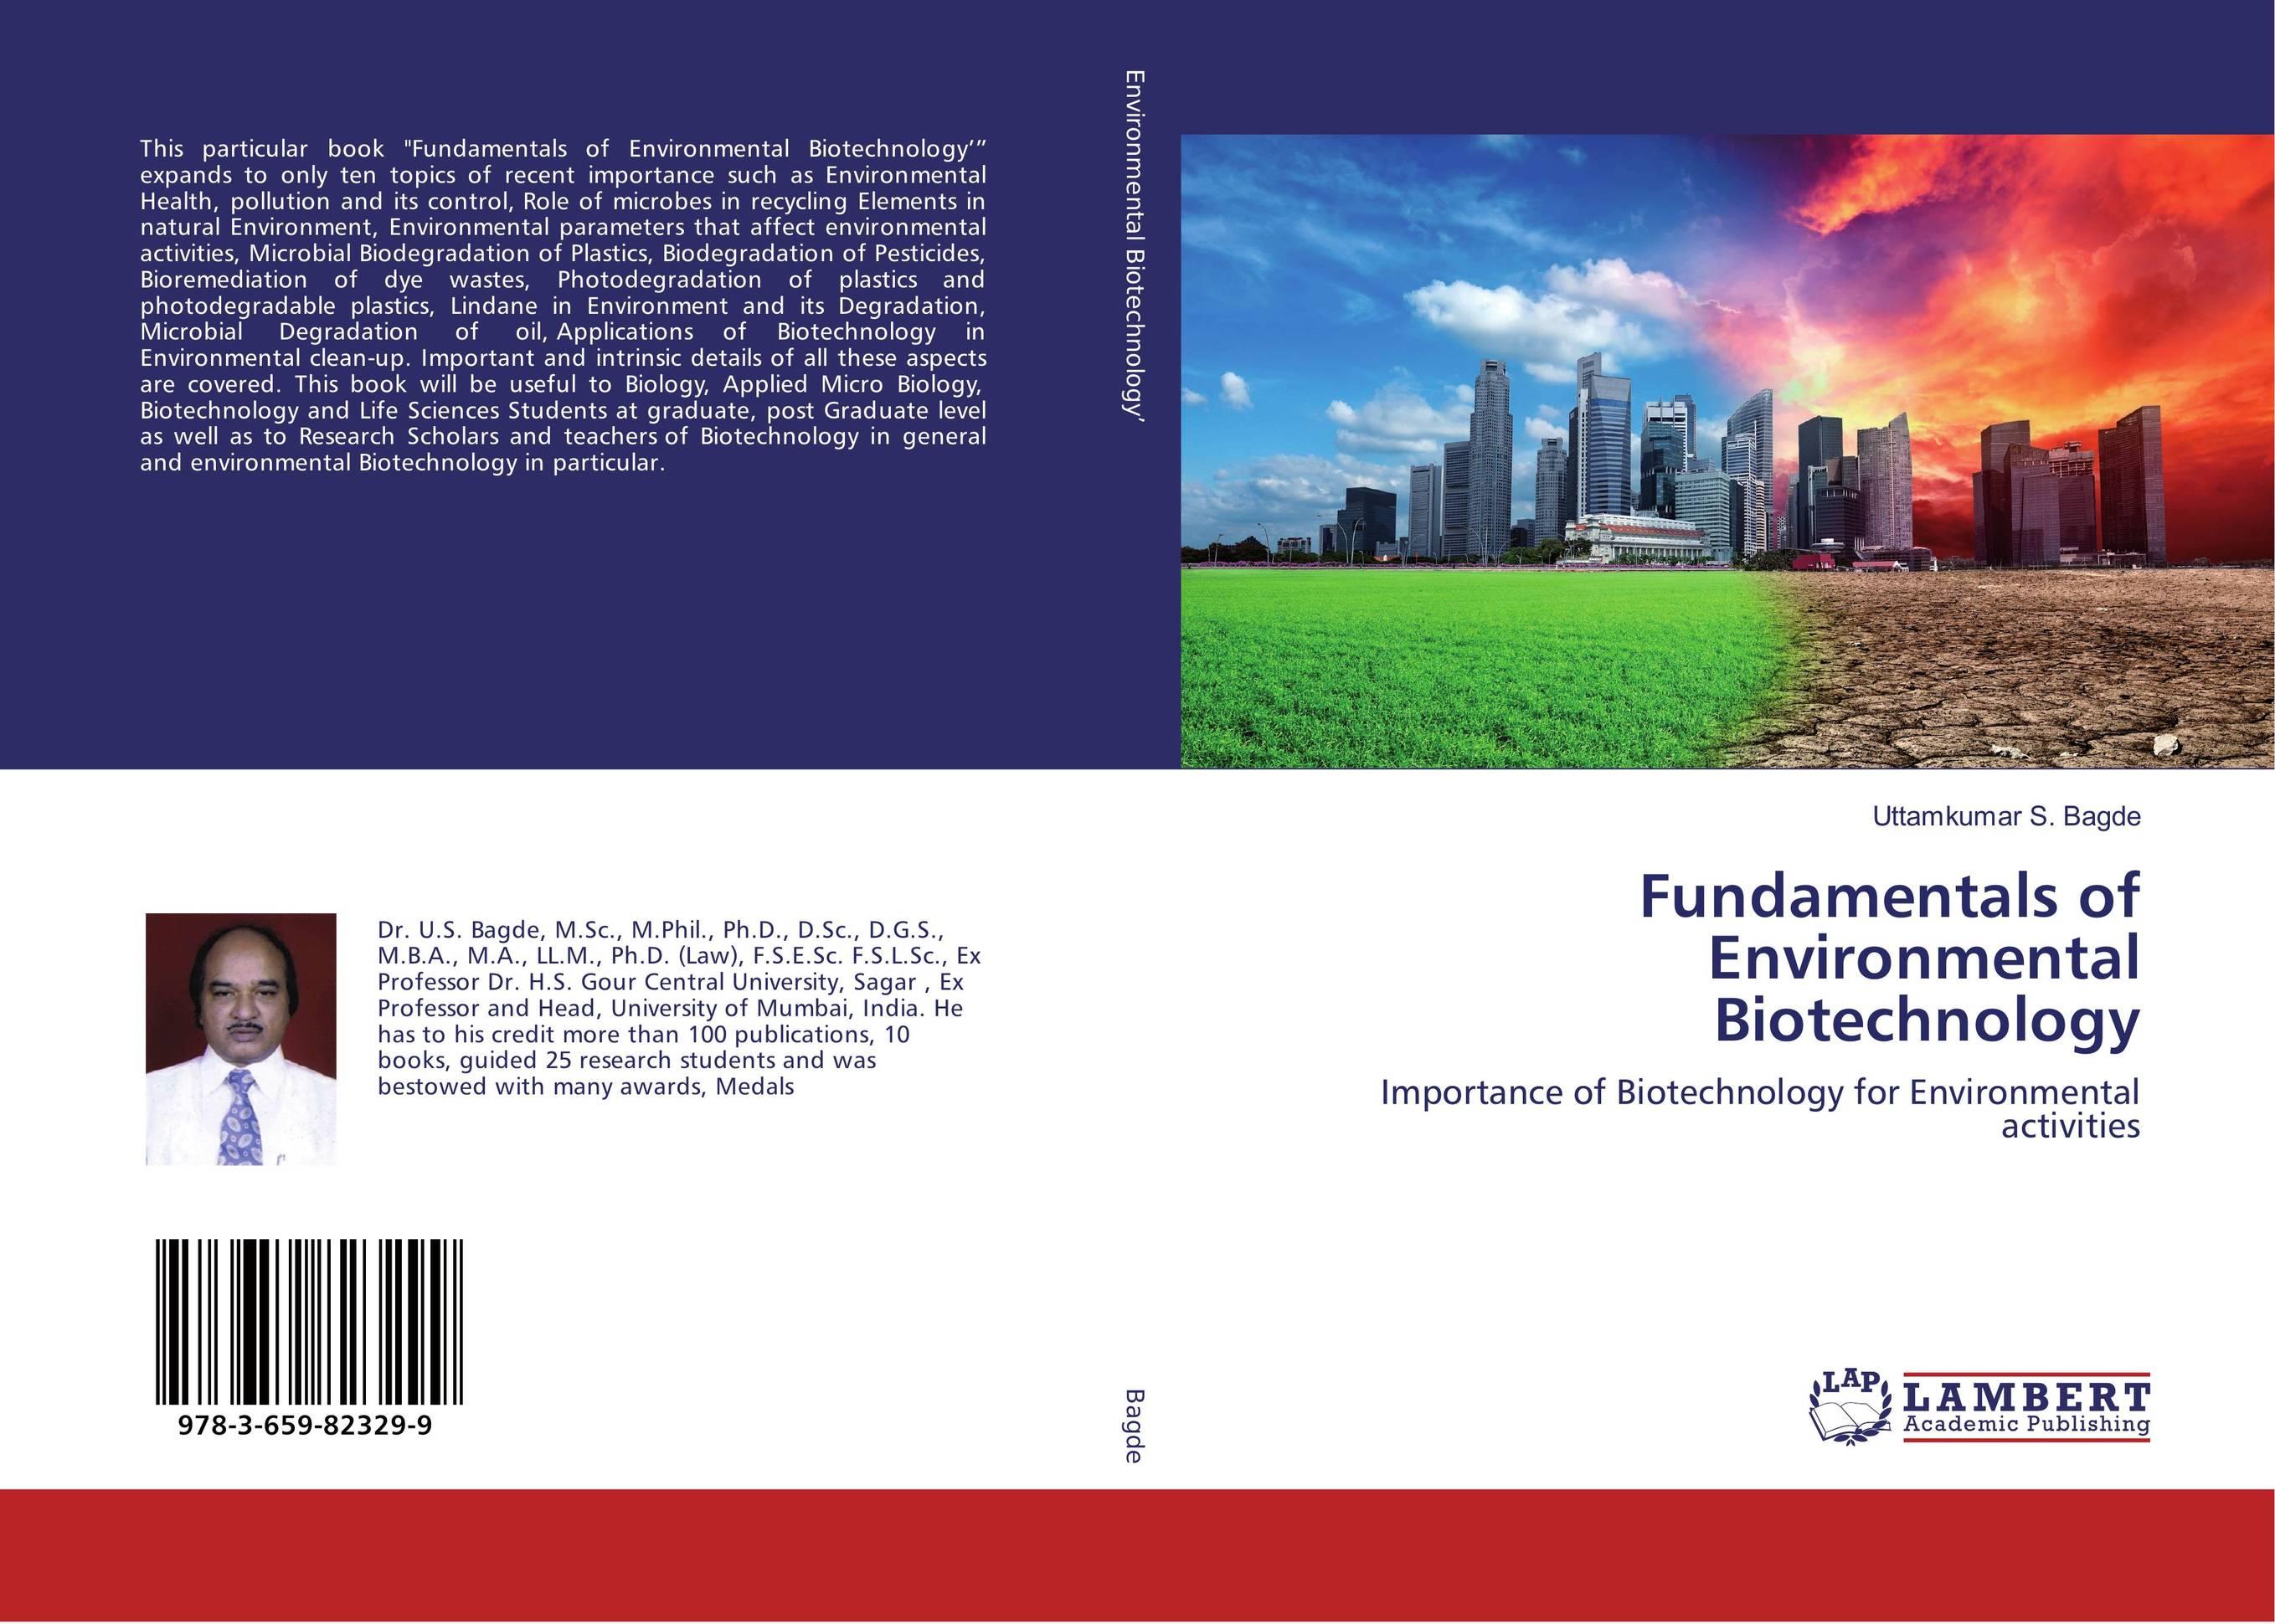 Fundamentals of Environmental Biotechnology fundamentals for control of robotic manipulators